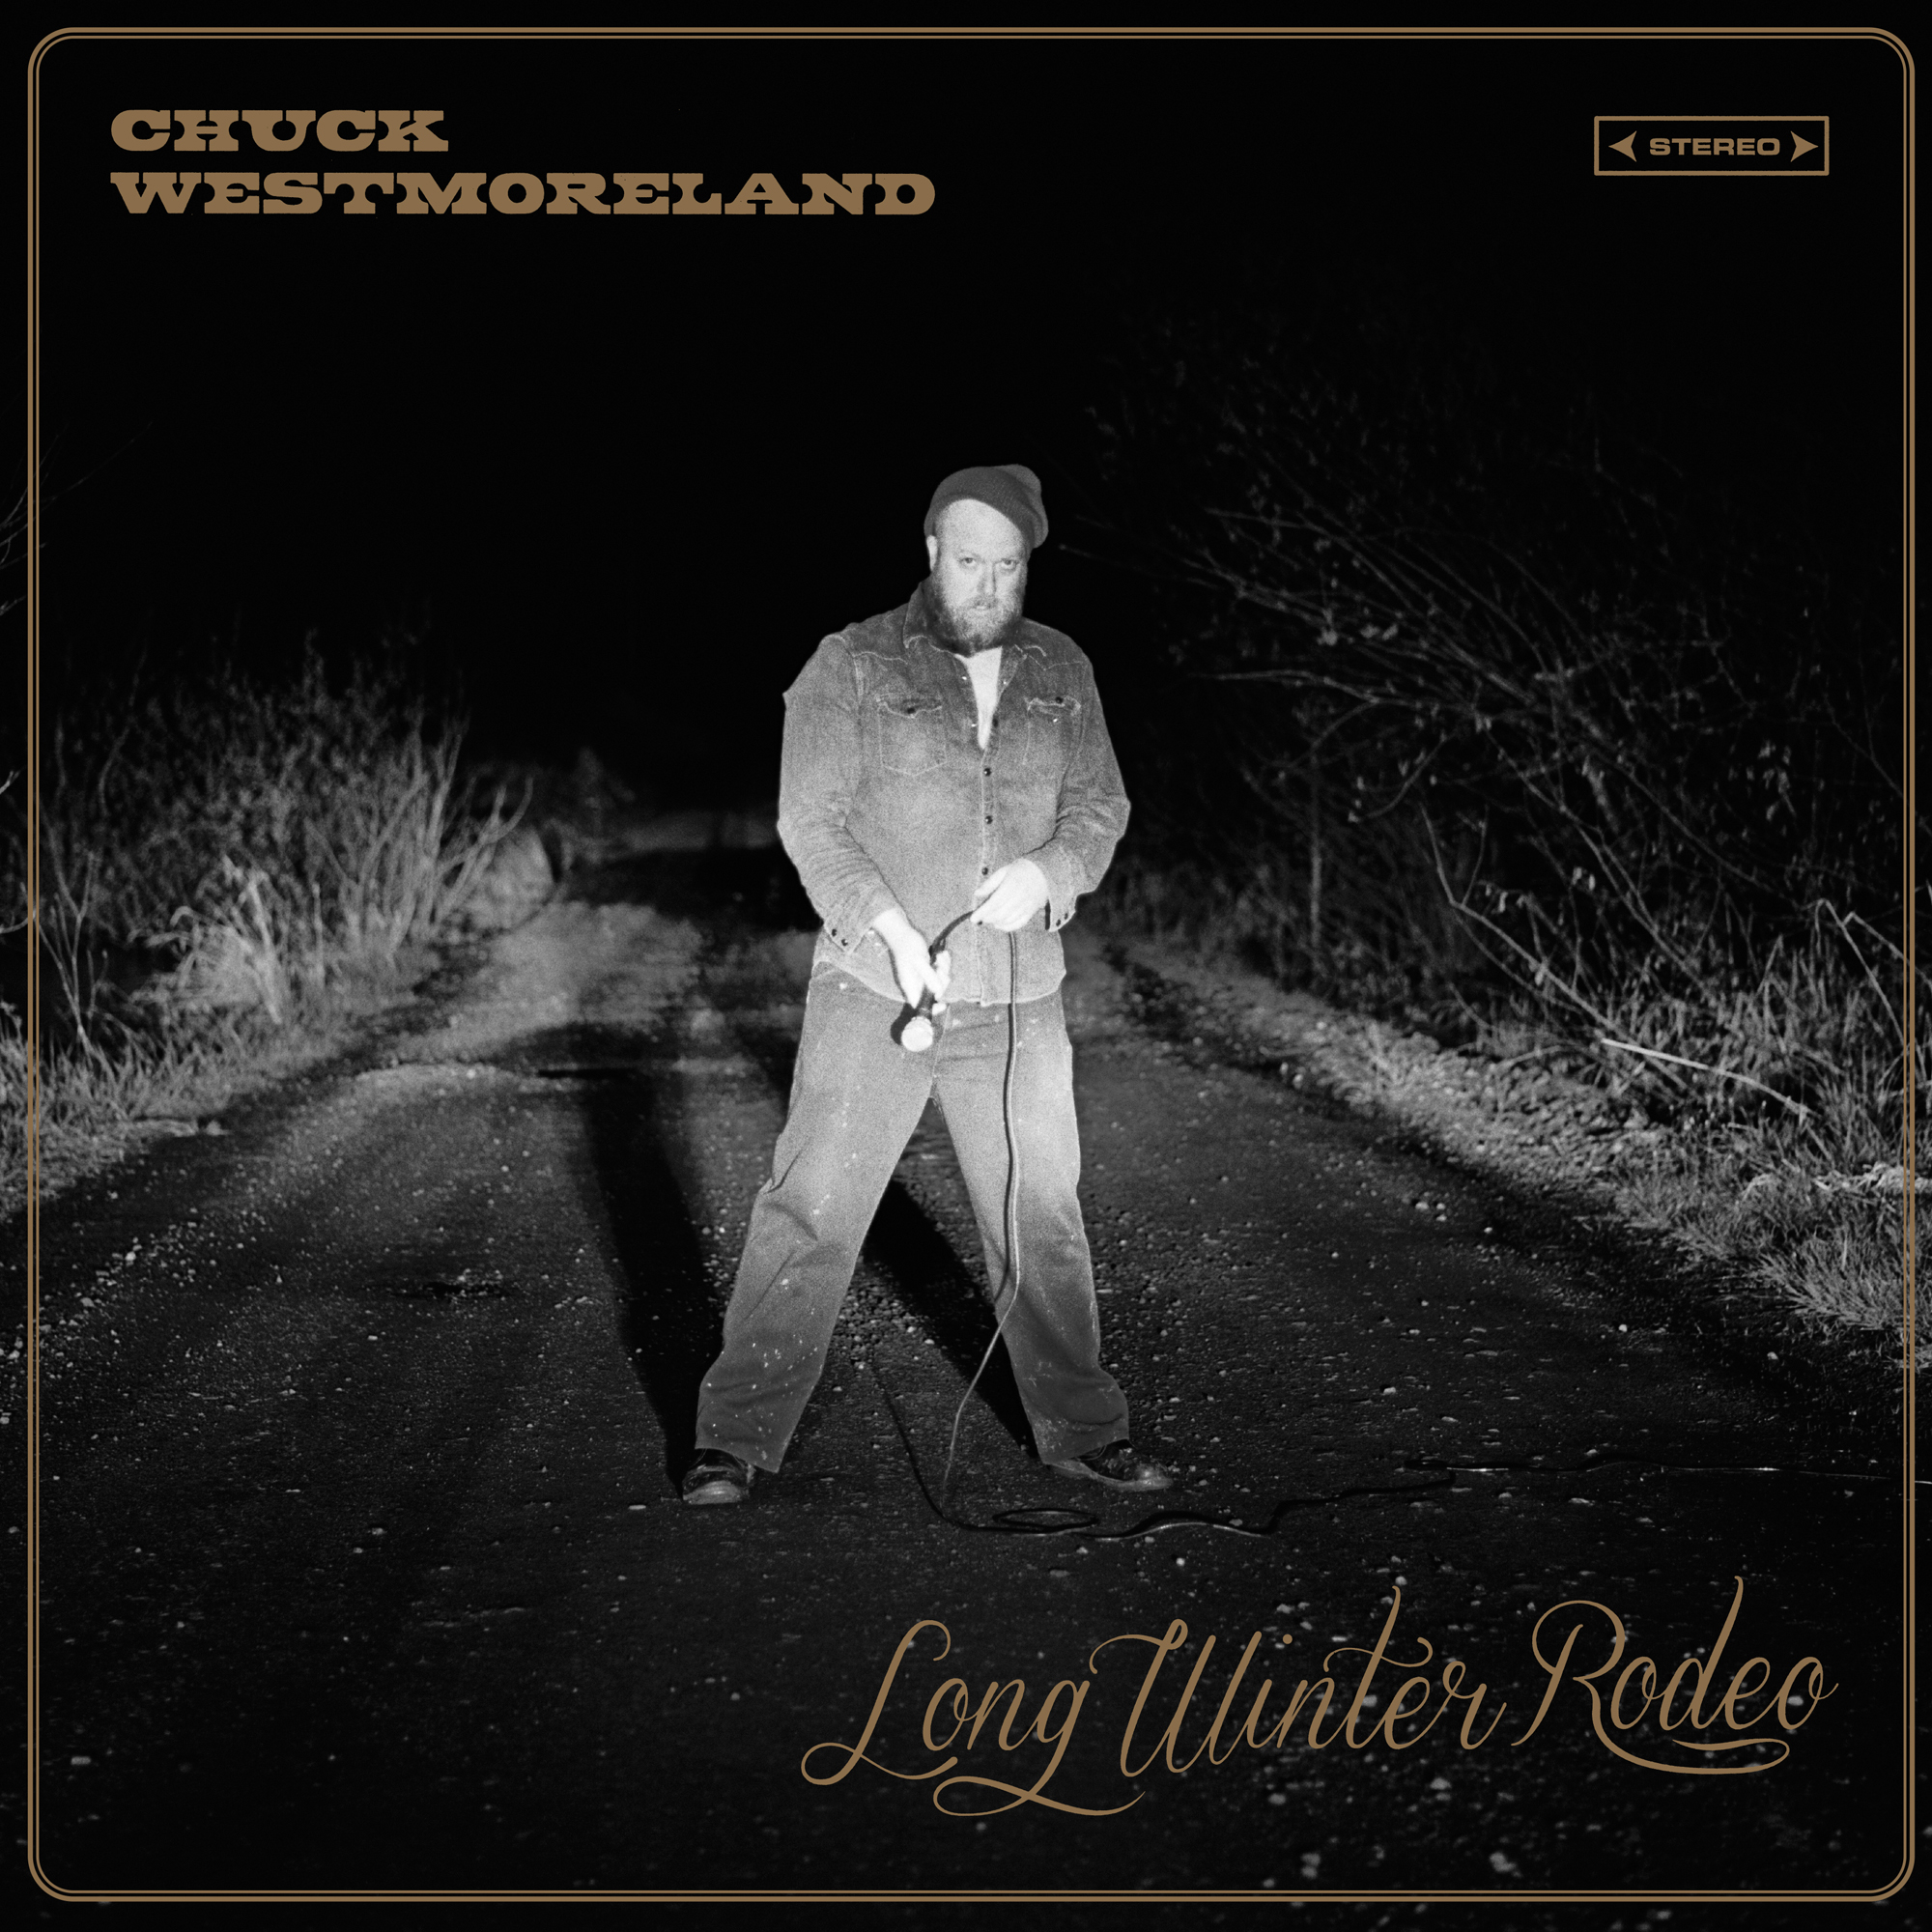 STREAM: Chuck Westmoreland, 'Long Winter Rodeo'